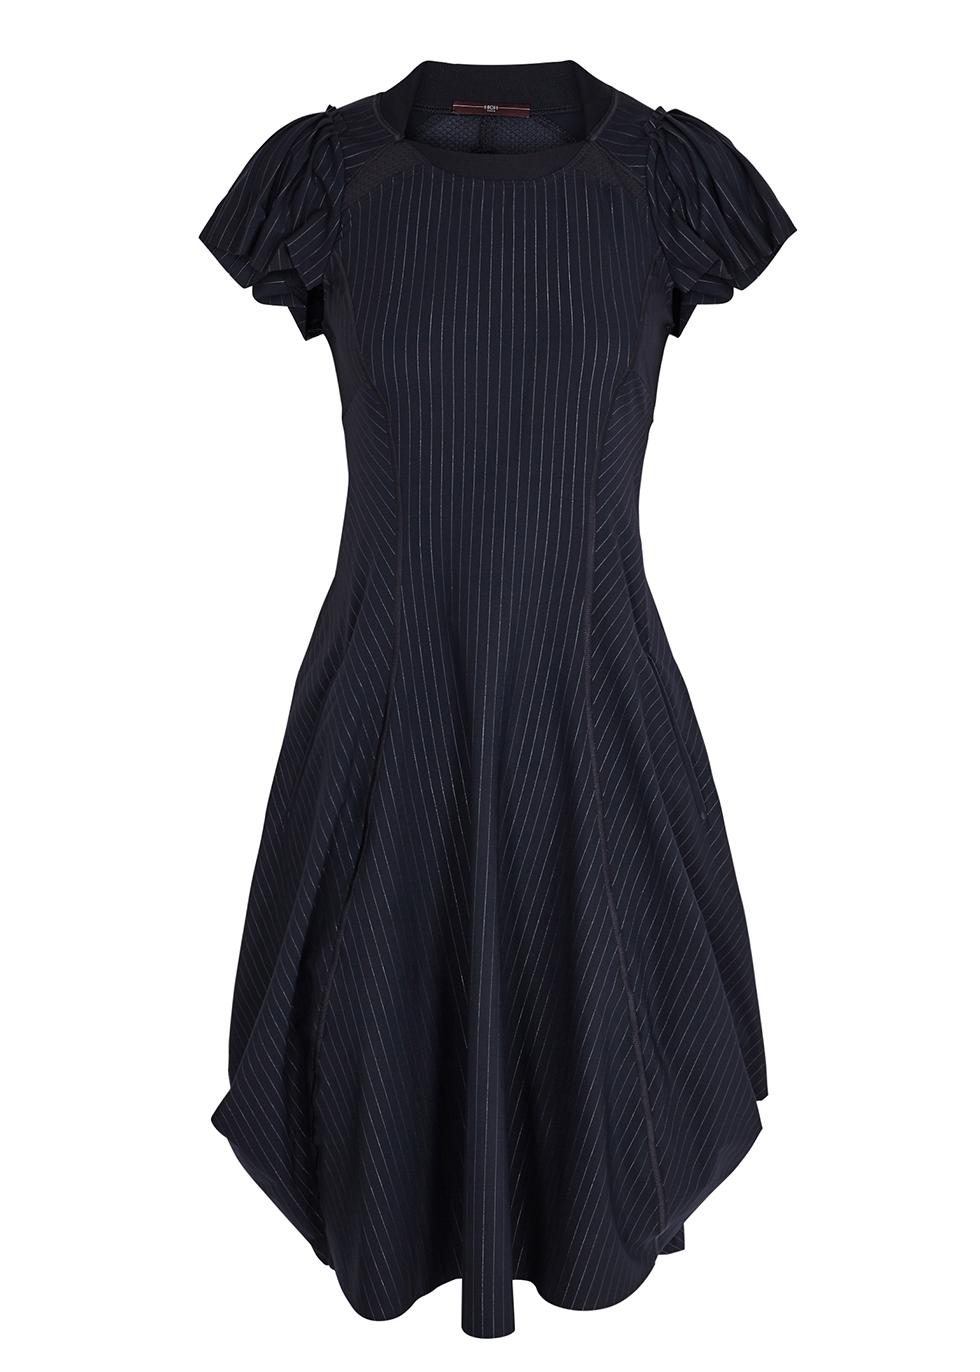 90a417e7a32 Designer Day Dresses - Luxury Brands - Harvey Nichols